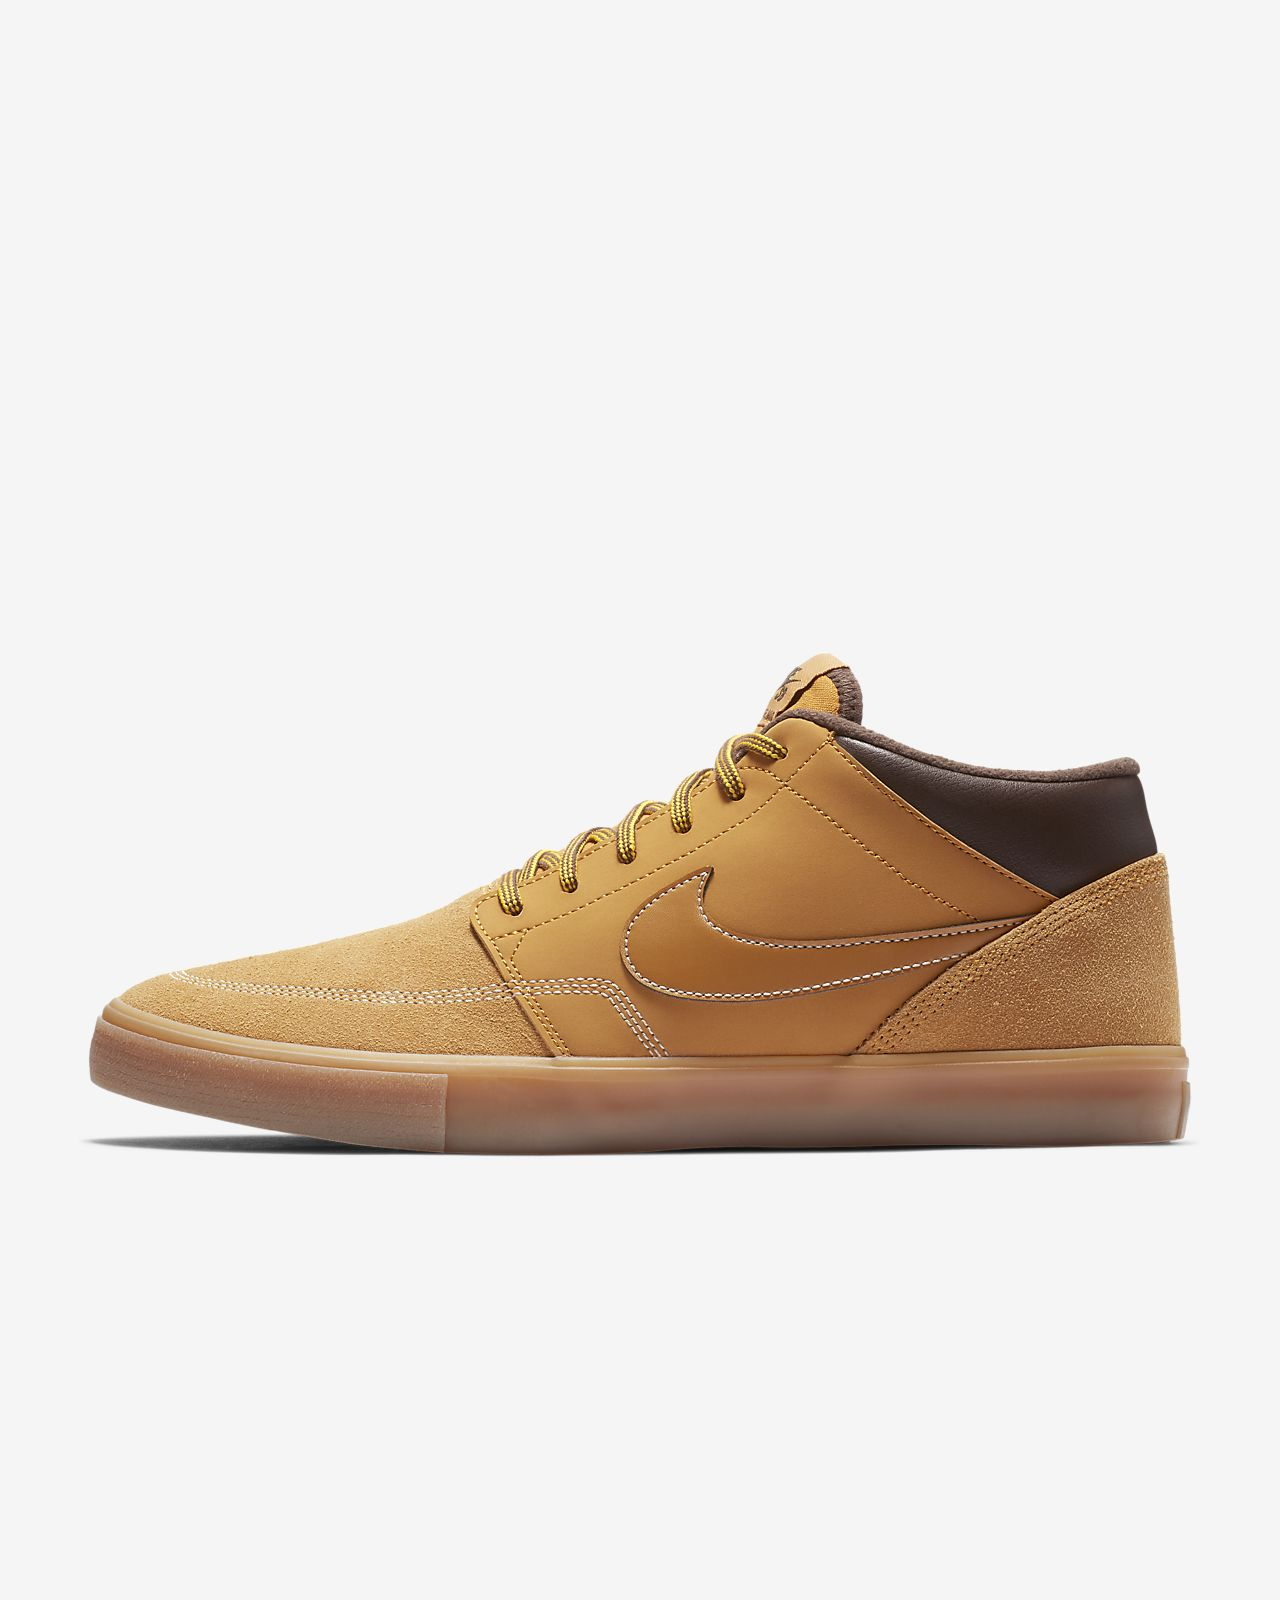 Chaussure Portmore De Bota Solarsoft Homme Mid Ii Skateboard Nike Sb Pour qpSVUzMLG